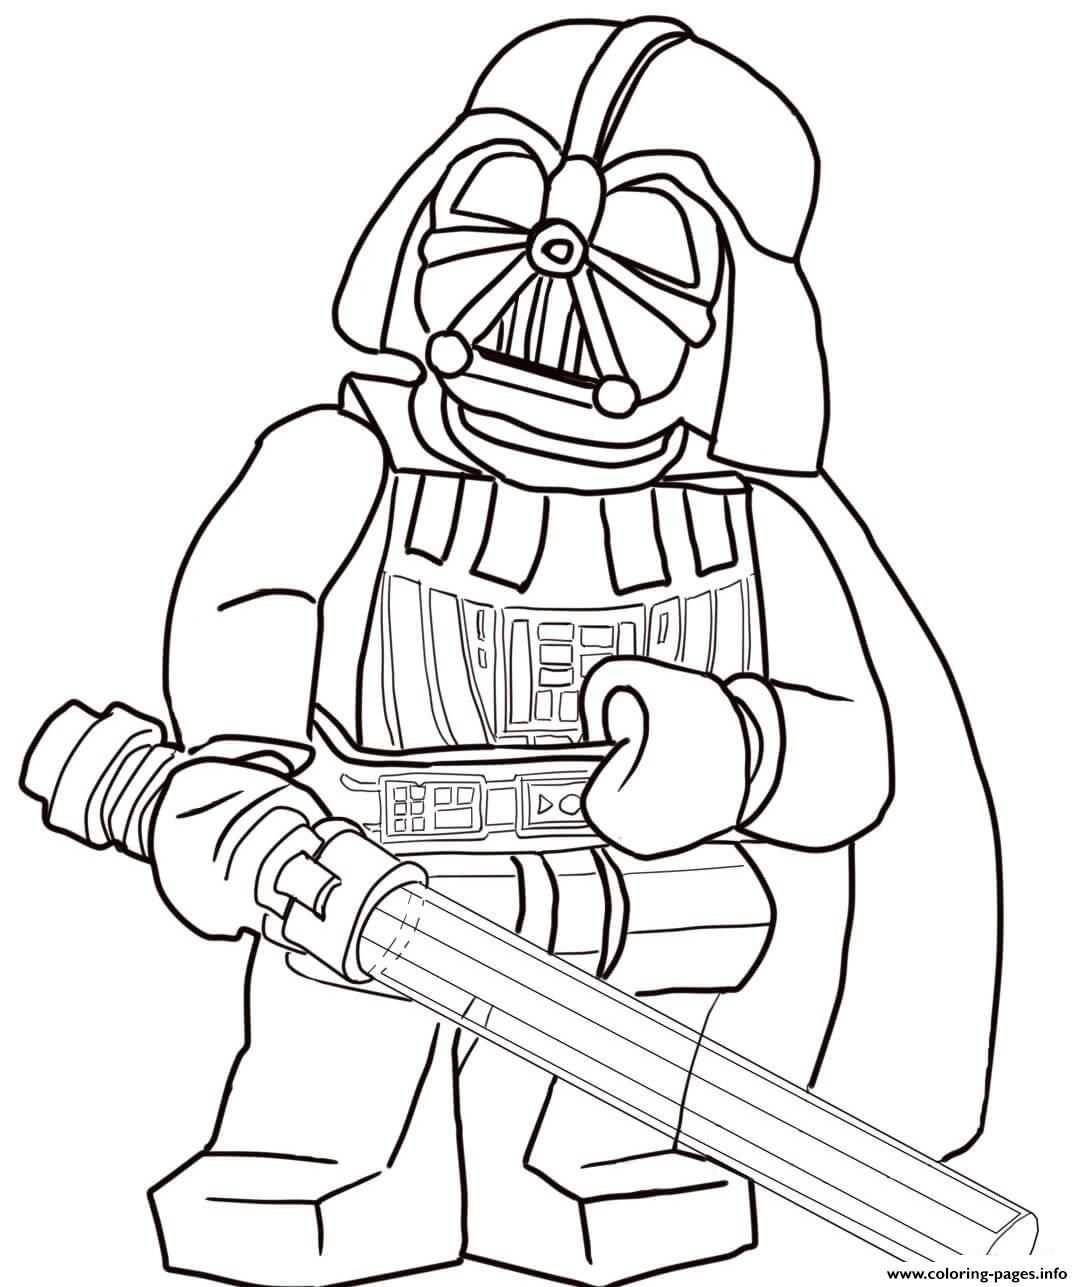 Print Lego Star Wars Darth Vader Coloring Pages Kleurplaten